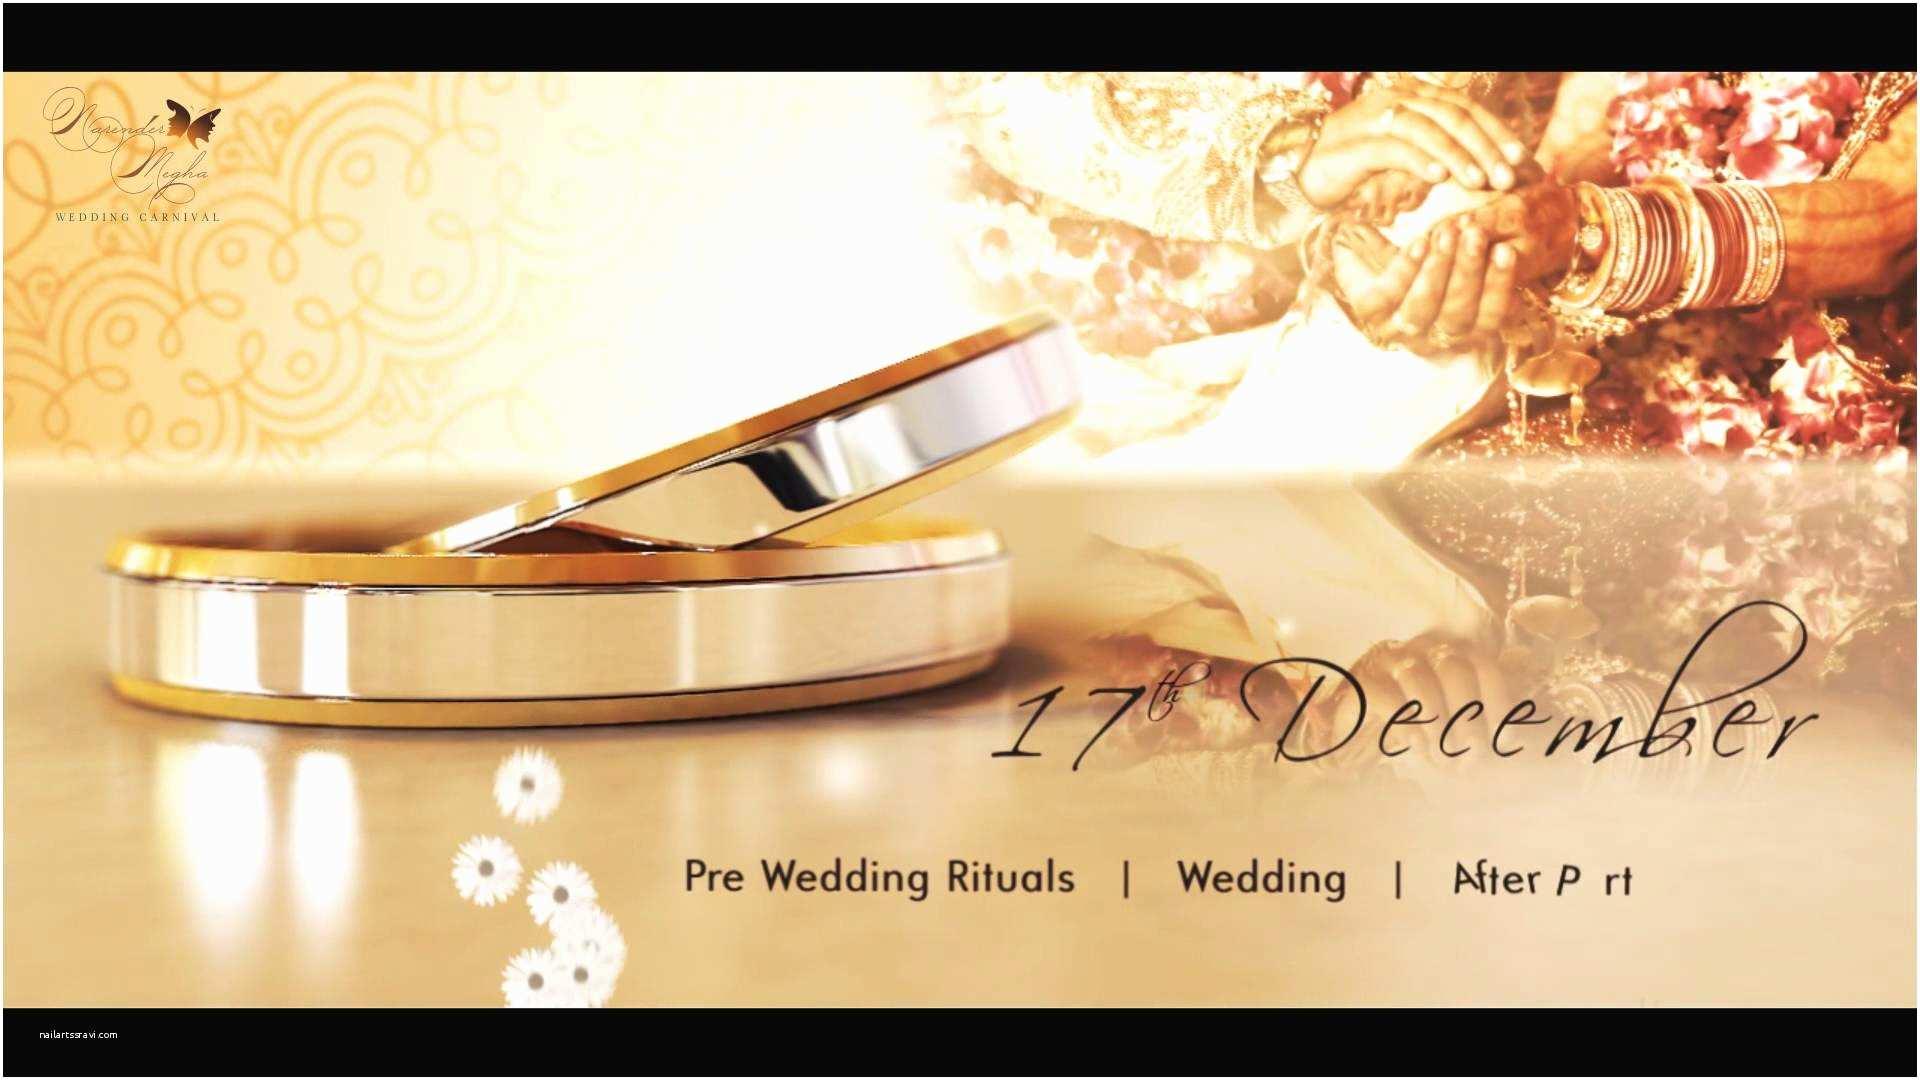 Wedding Invitation App Makr Ipad App for Your Wedding Invitations ...